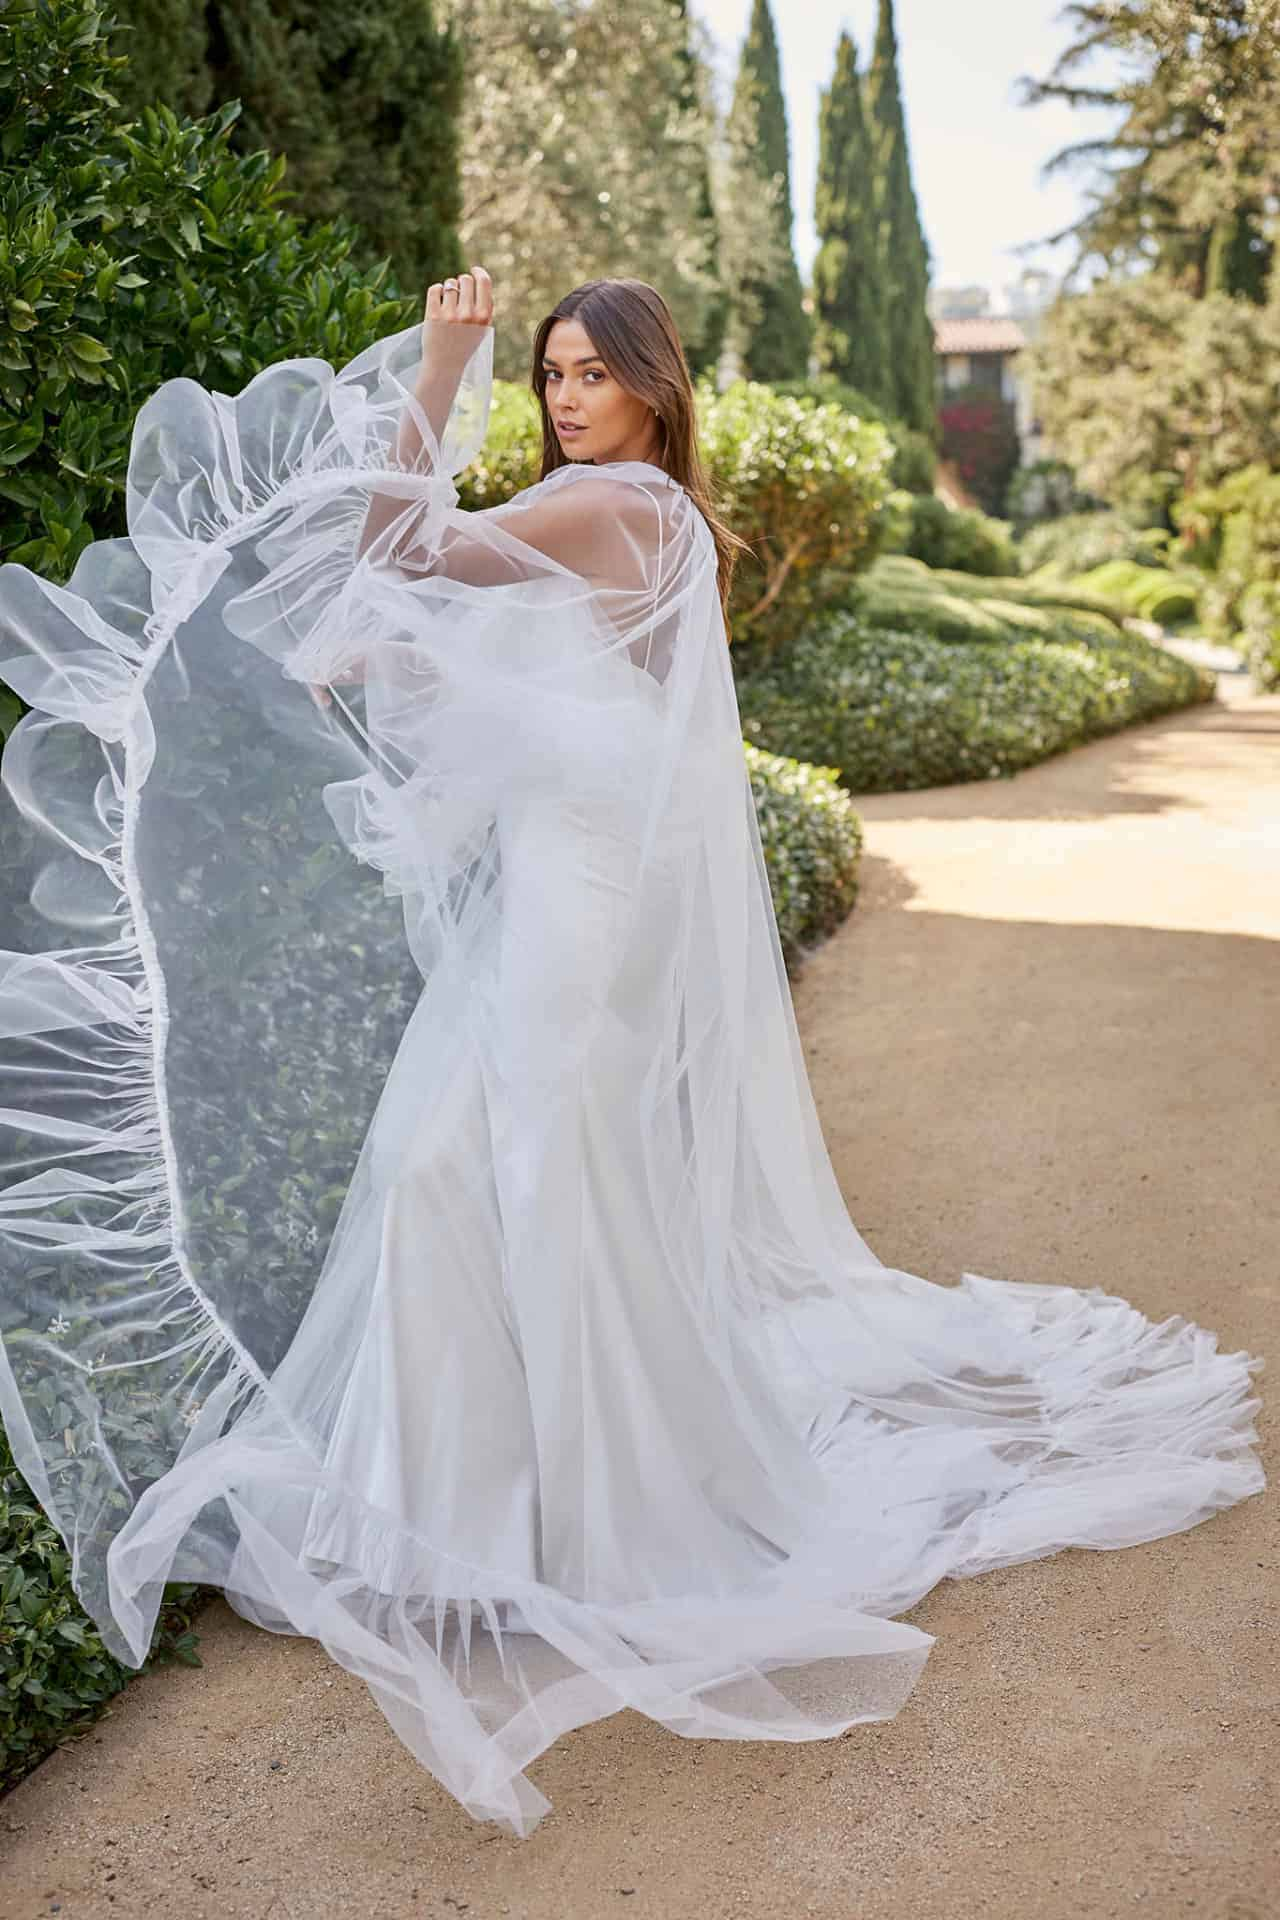 a wedding dress with cape by Monique Lhuillier